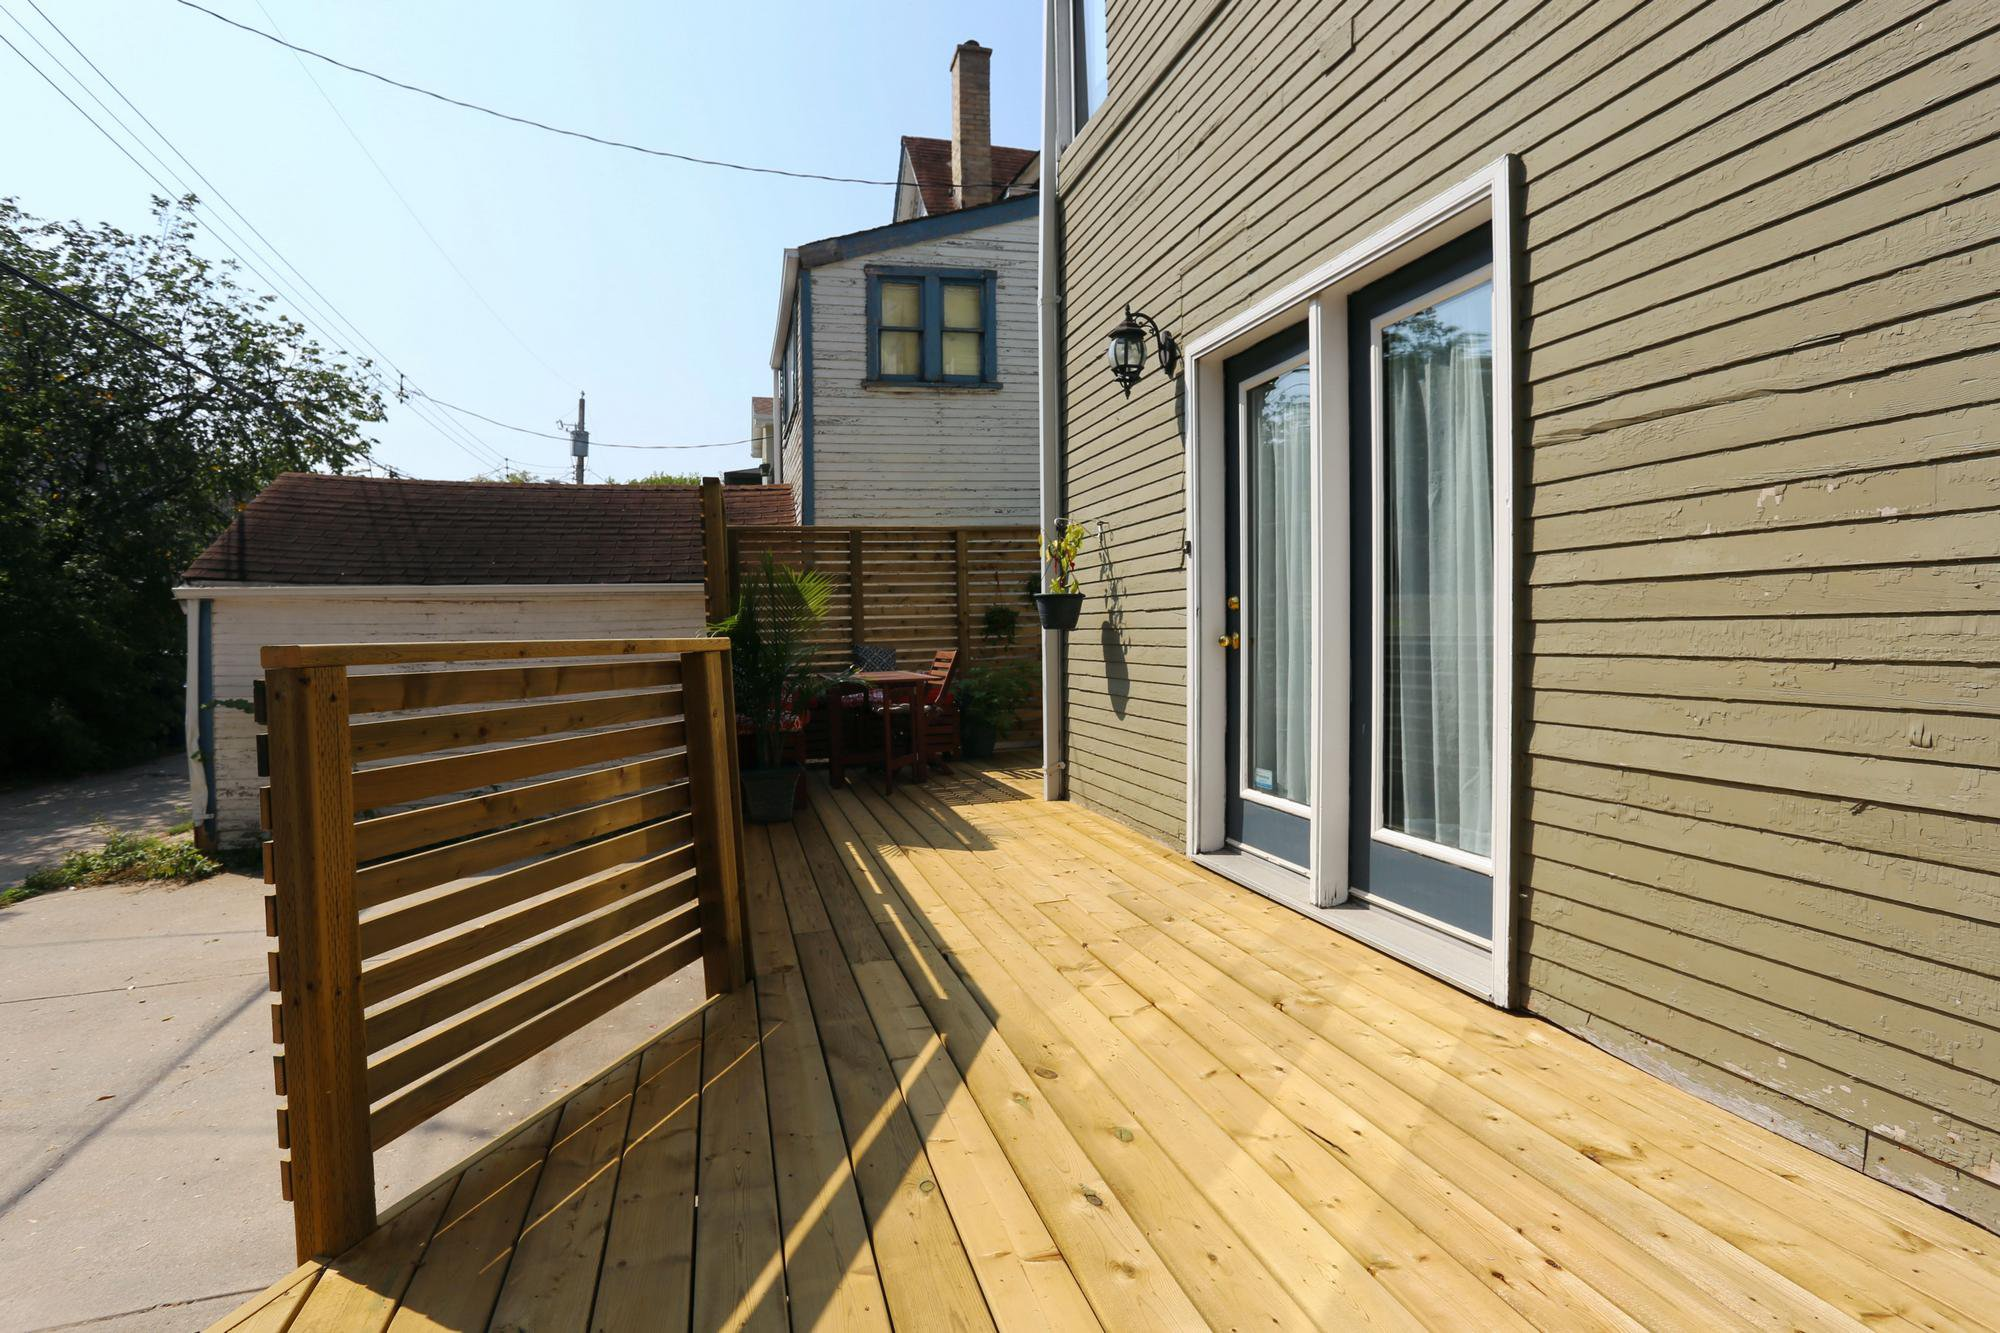 Photo 37: Photos: 105 Evanson Street in Winnipeg: Wolseley Single Family Detached for sale (5B)  : MLS®# 1821900